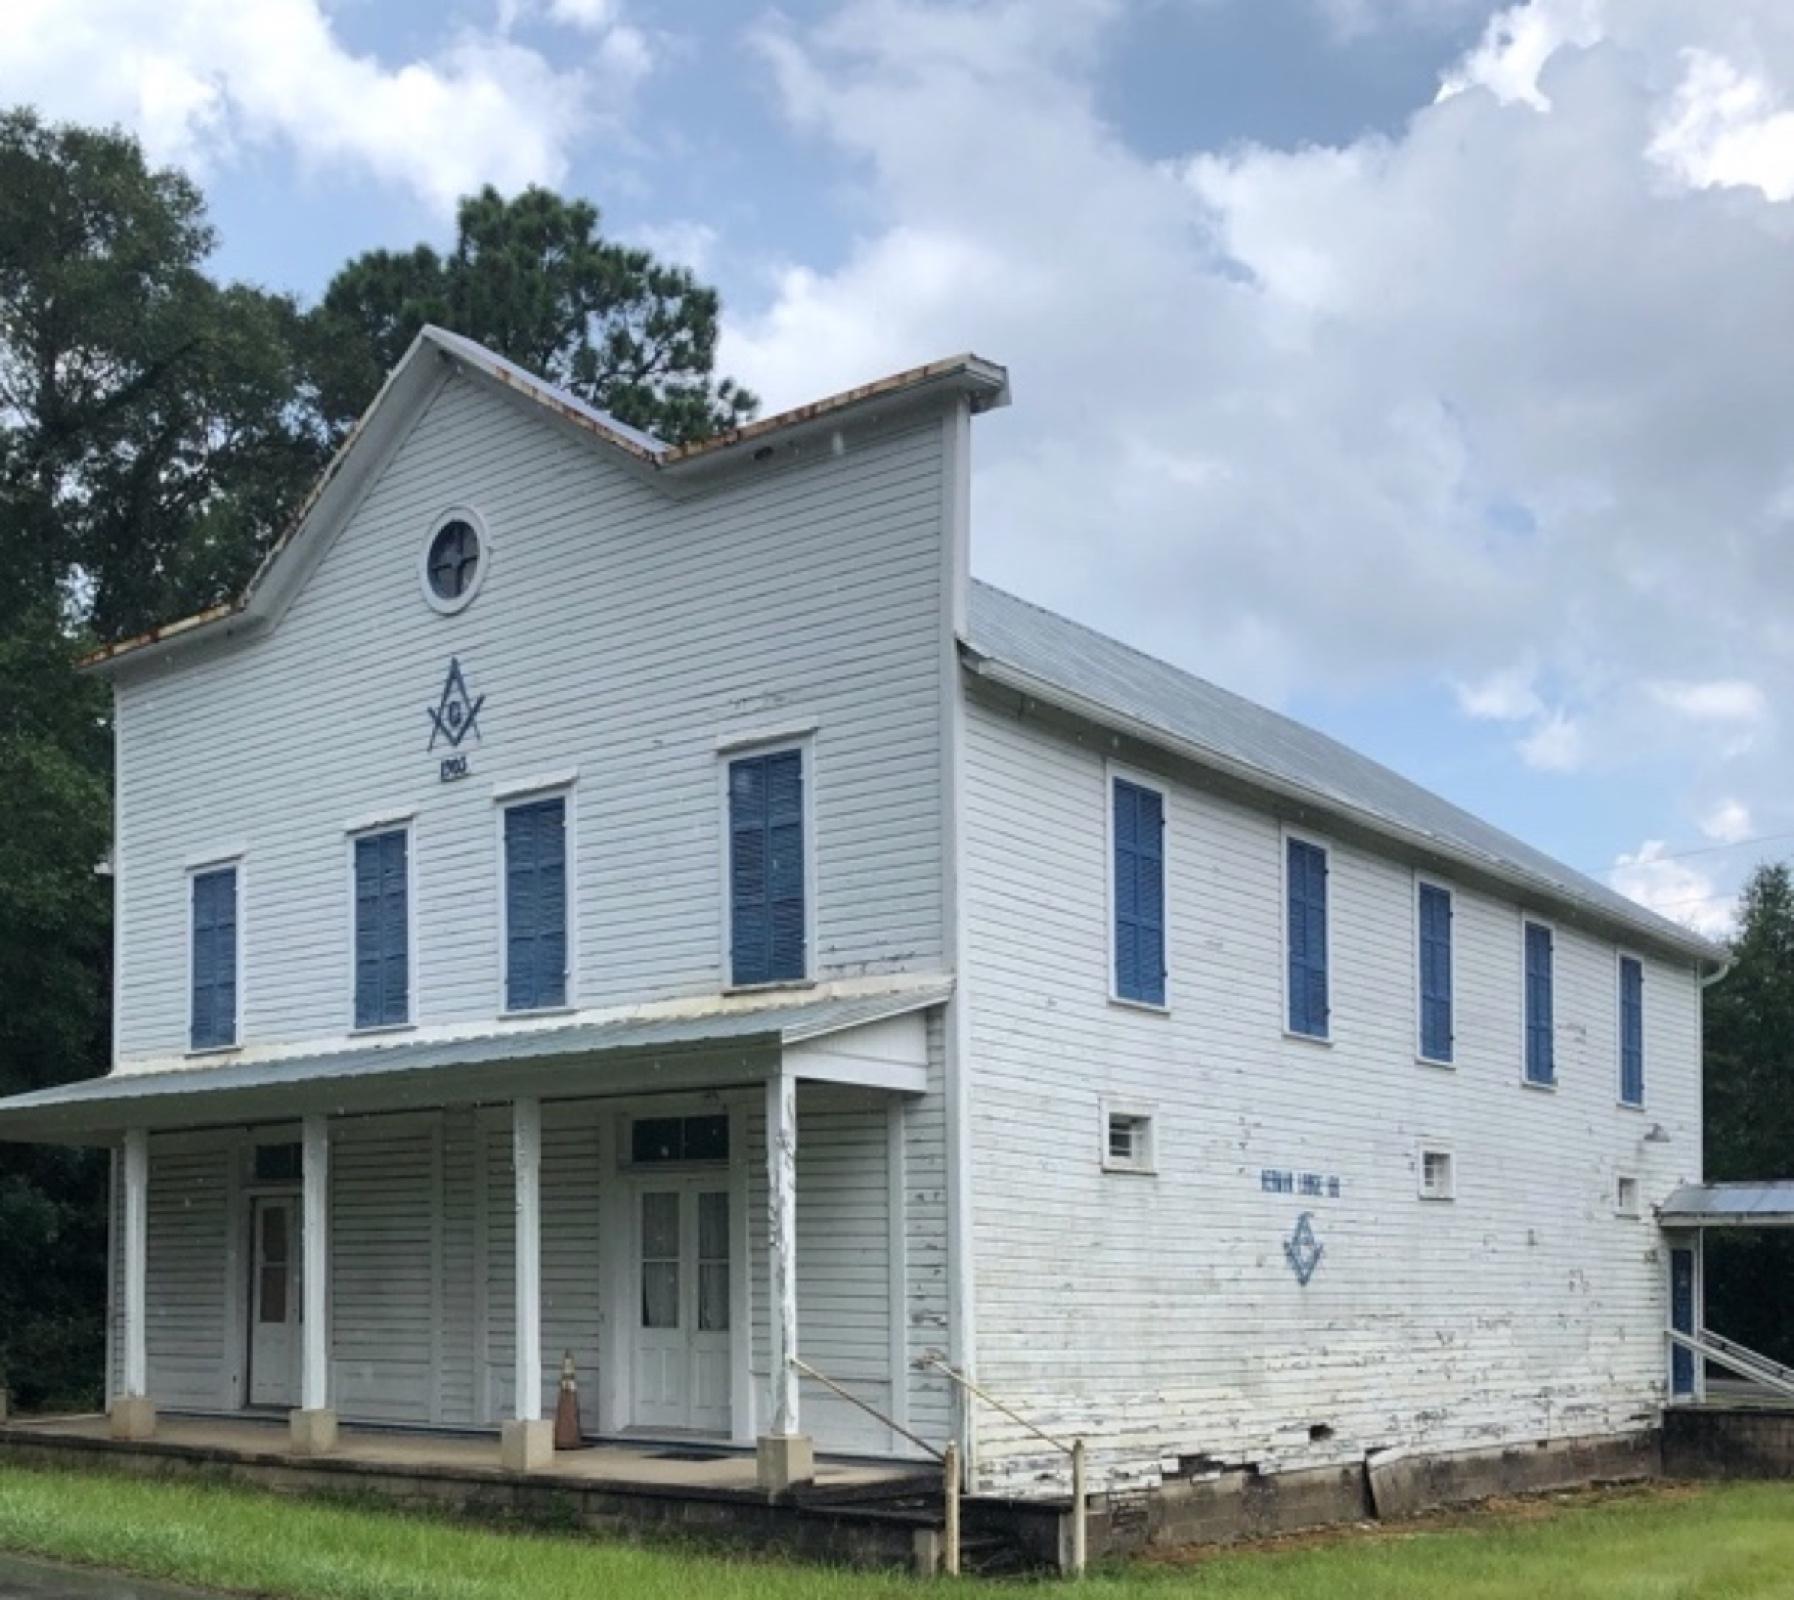 Herman Lodge No. 108 F&AM